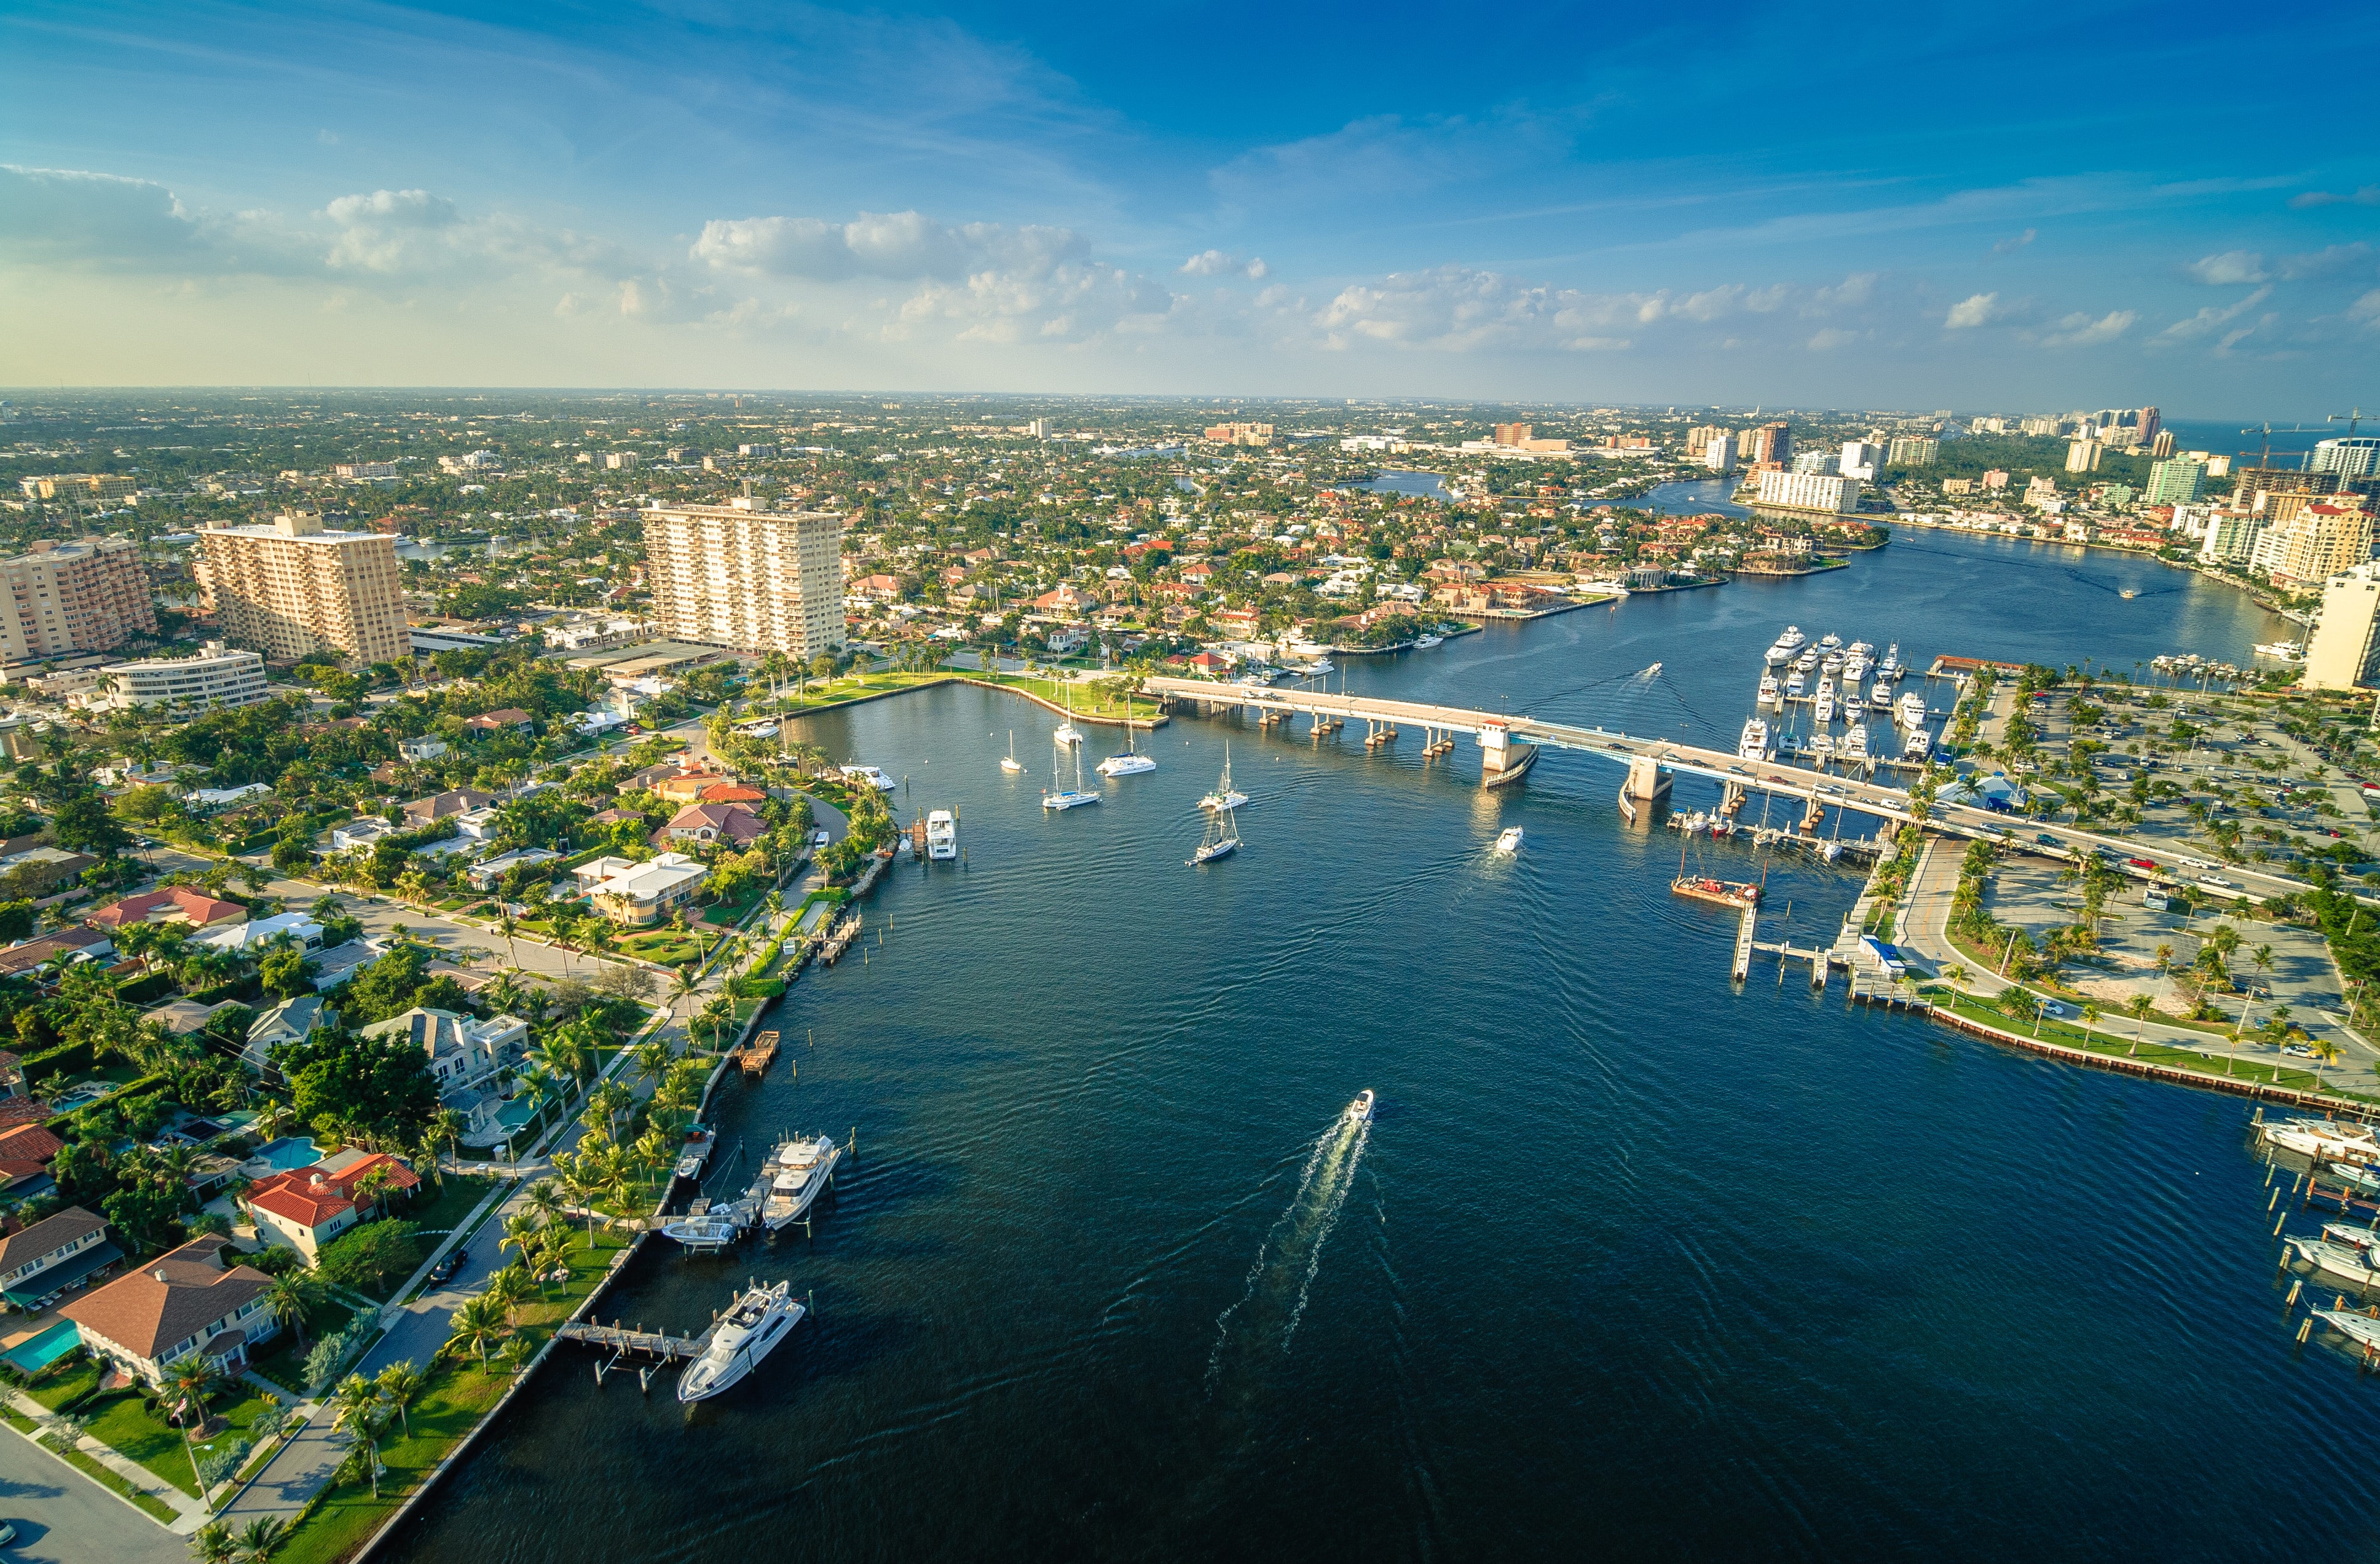 Top Fort Lauderdale Tours, Tickets & Activities